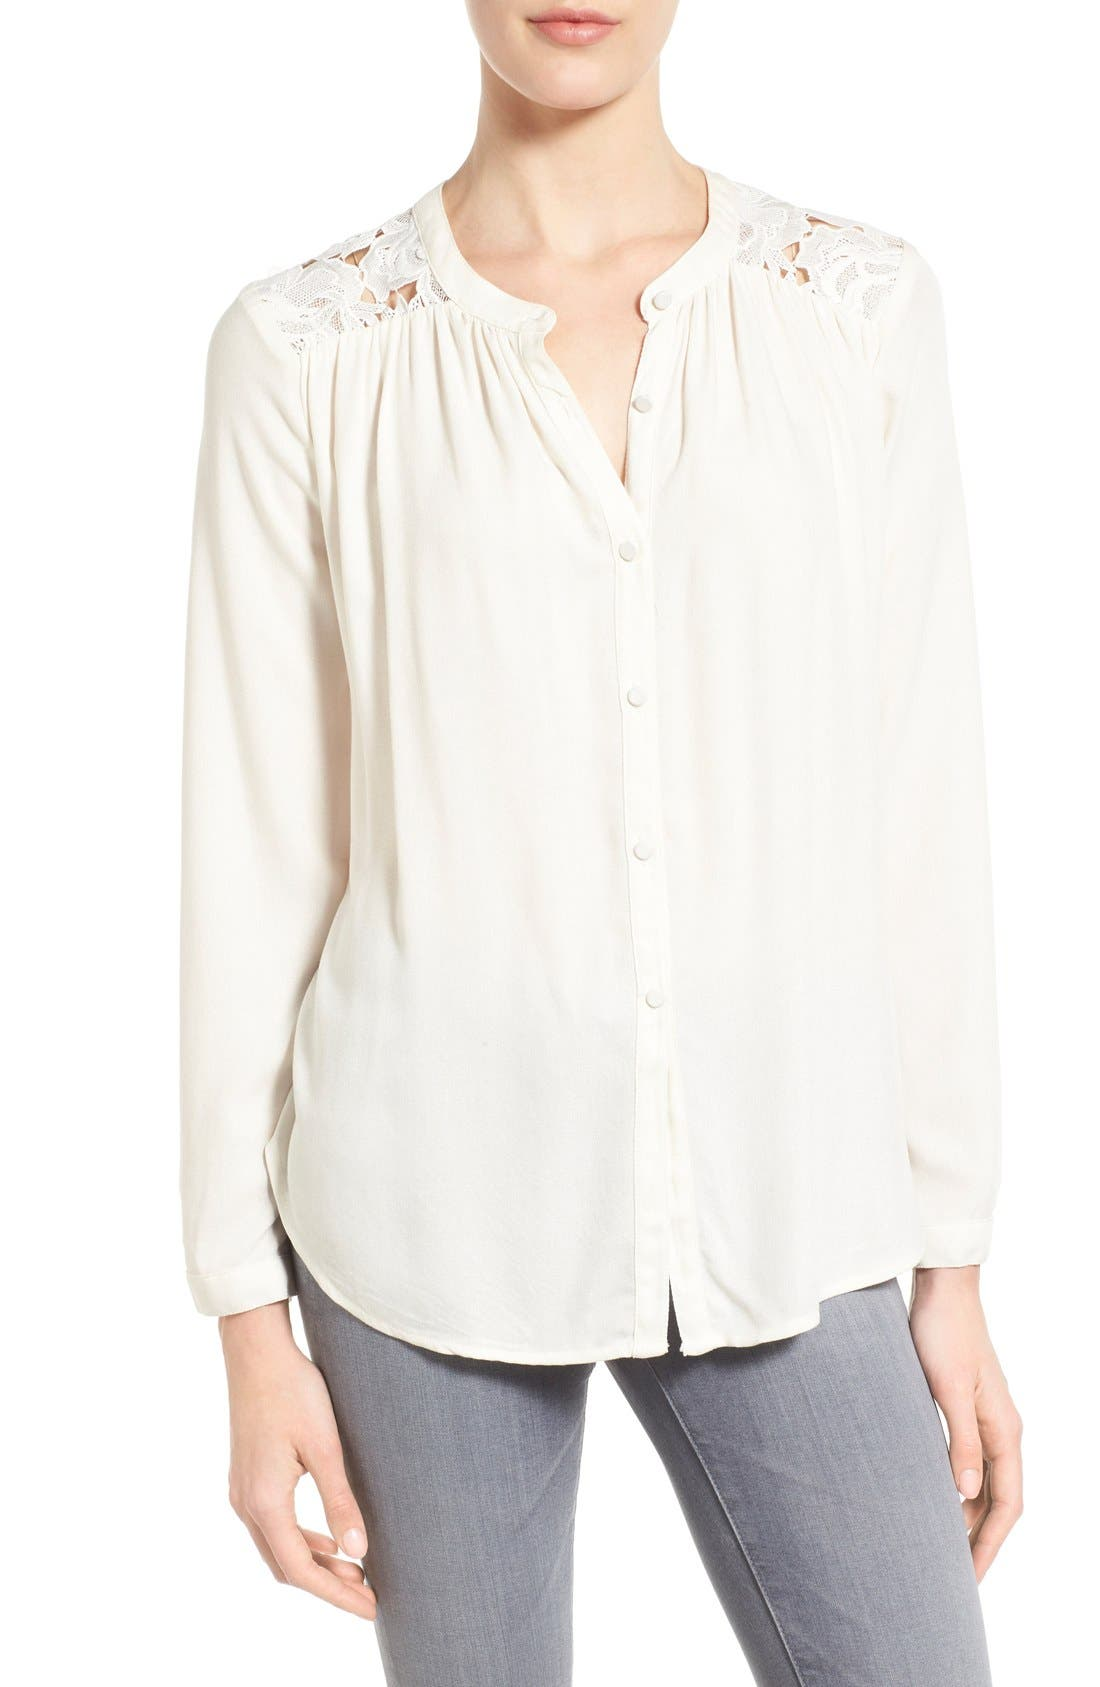 Main Image - Ella Moss 'Cresent' Lace Contrast Blouse